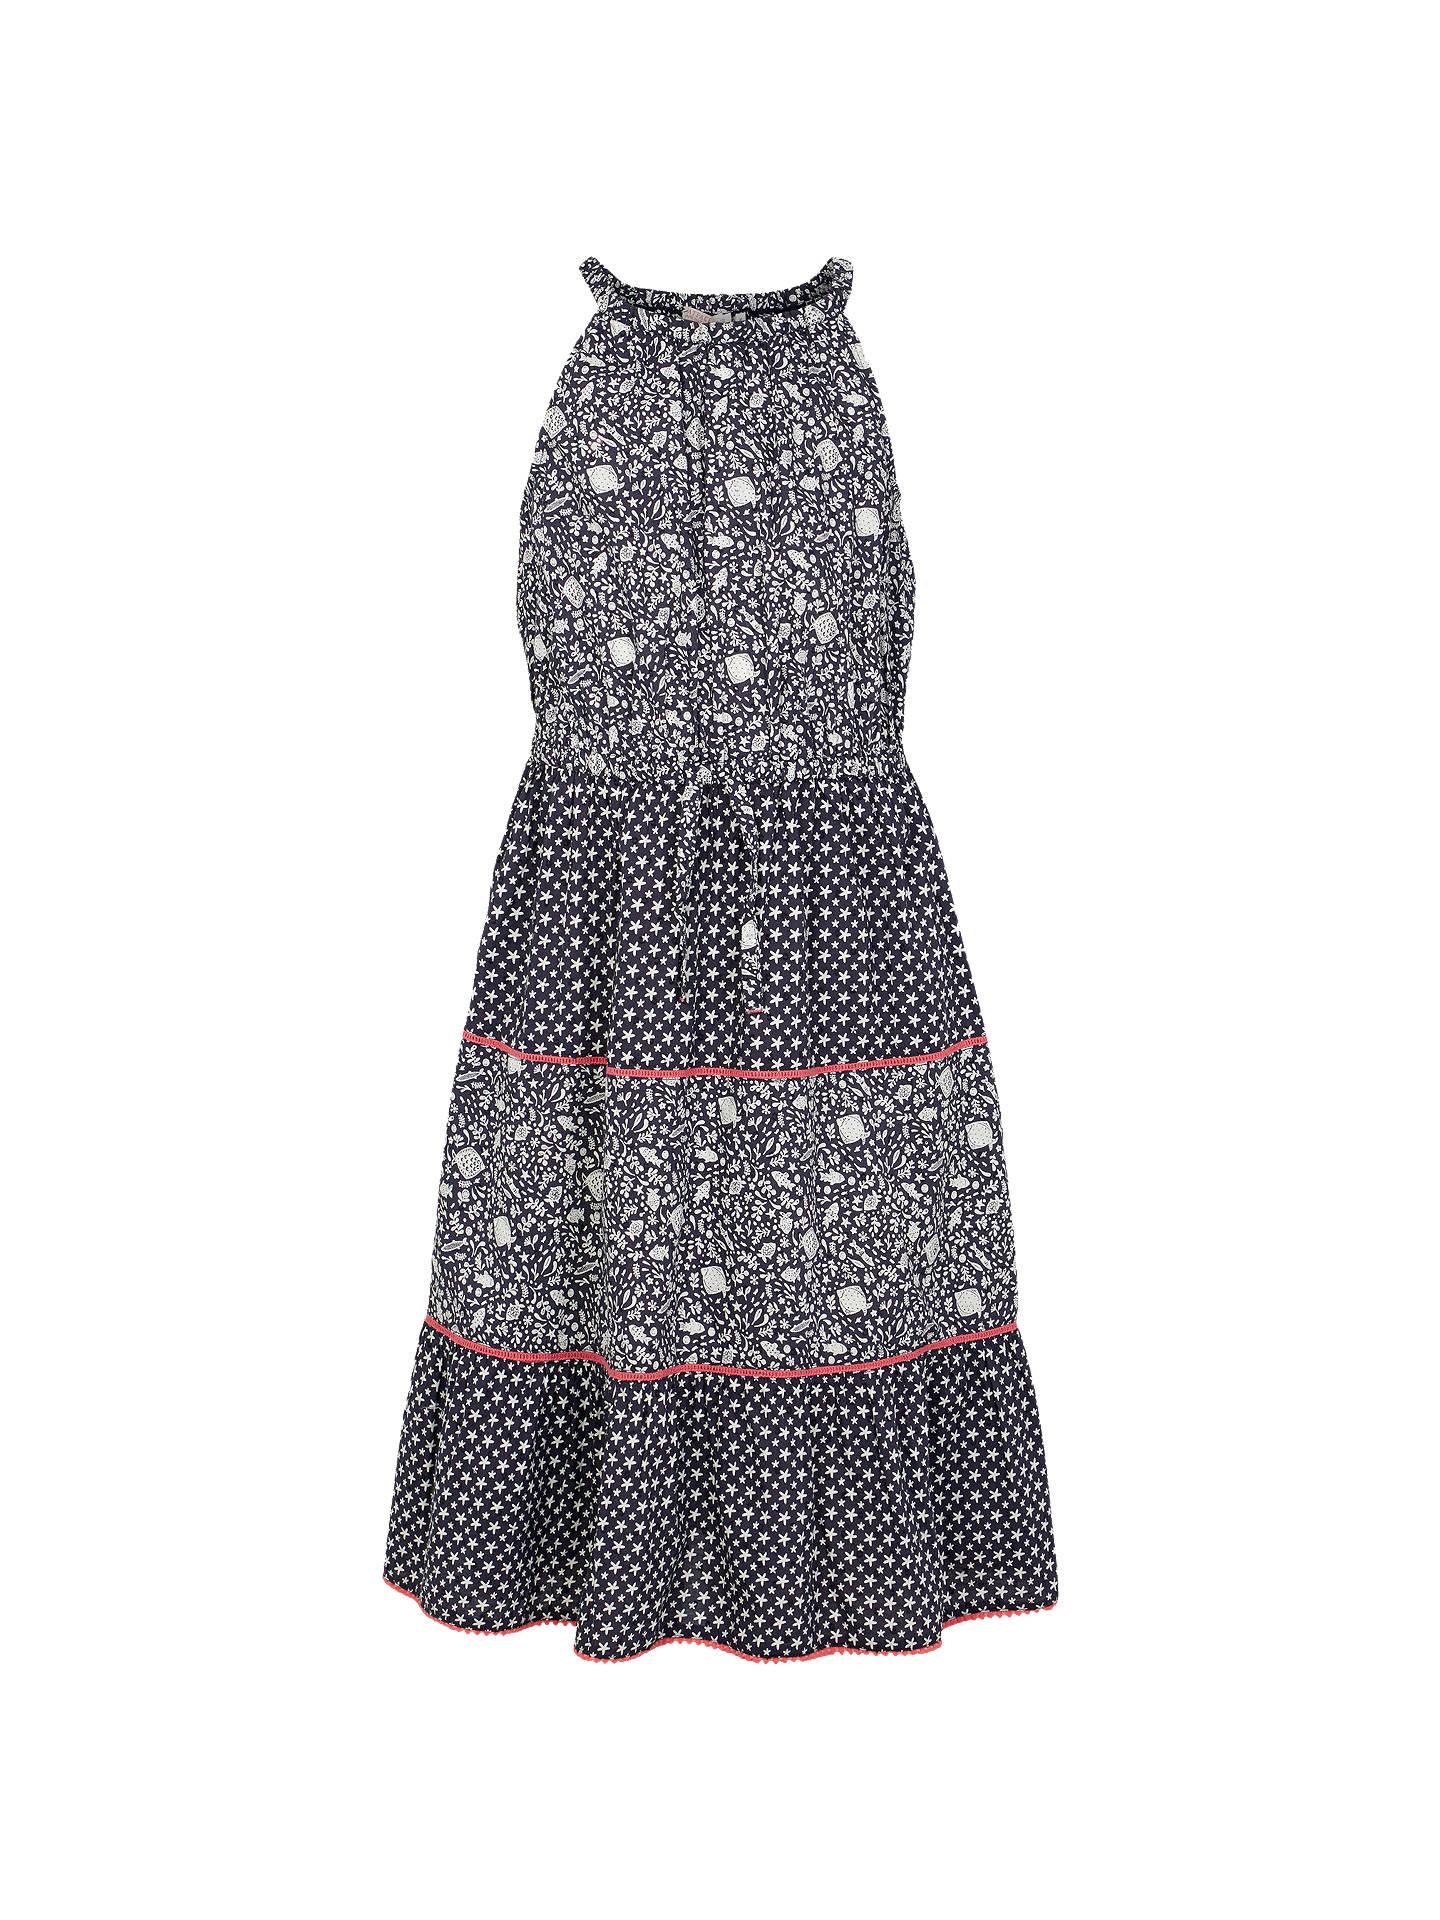 55ec61224a Buy Fat Face Girls' Edith Fish Dress, Navy, 2-3 years Online ...